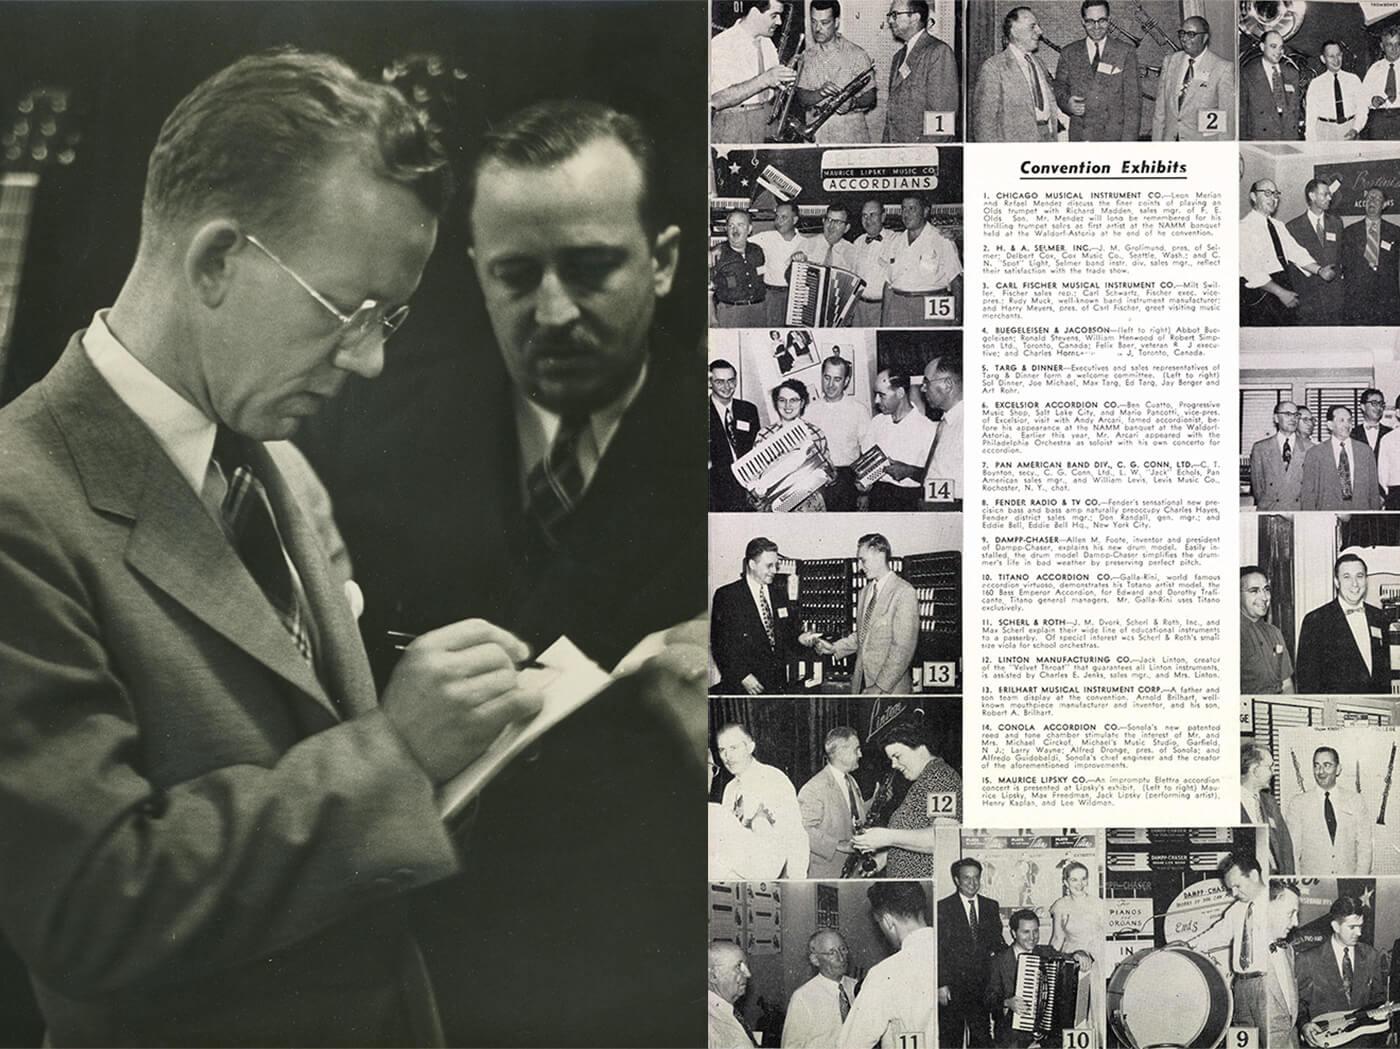 NAMM history CF Martin Signing Exhibit List